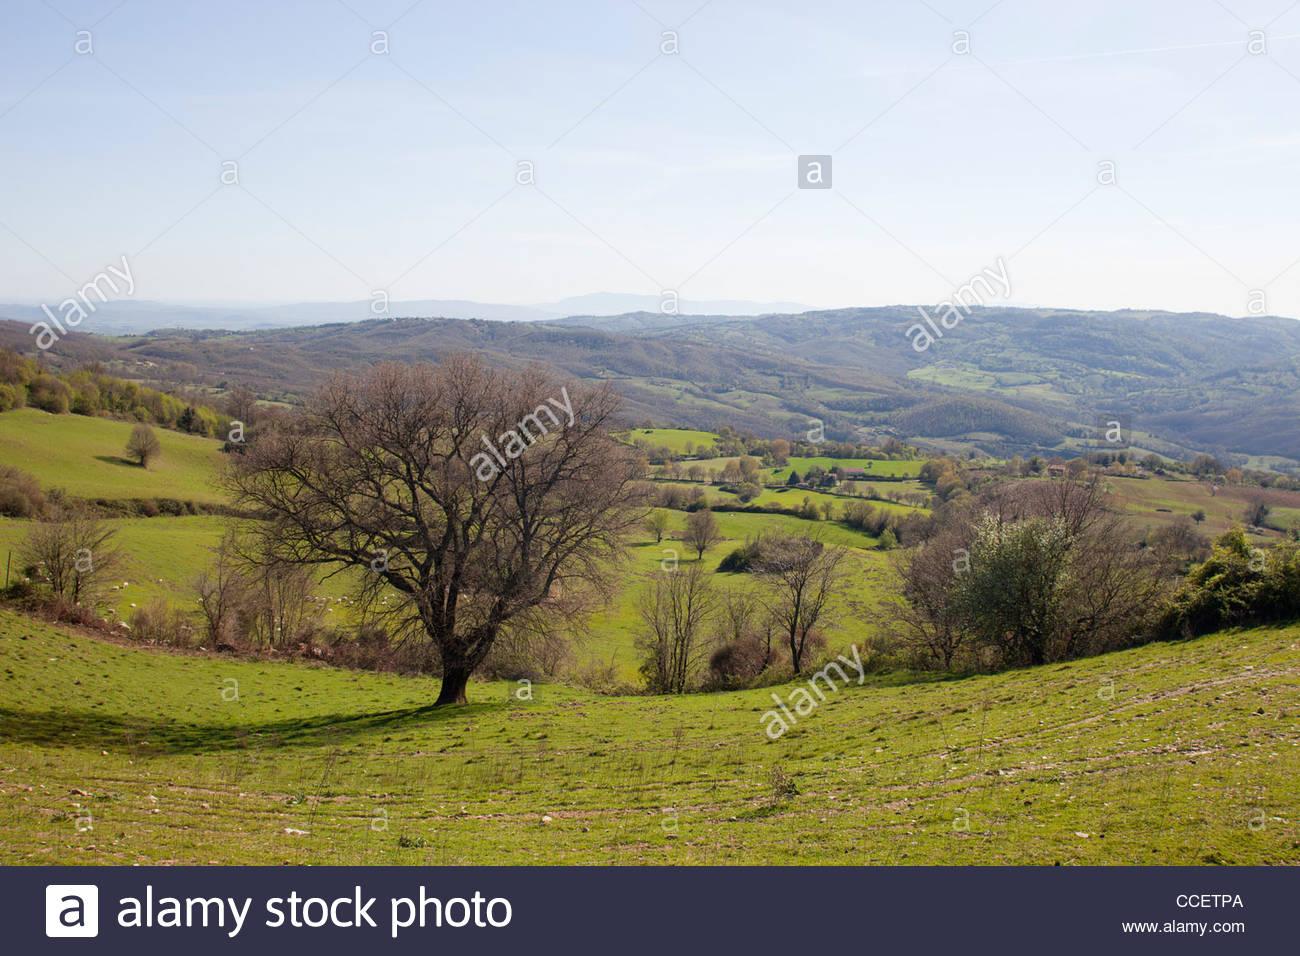 countryside,scansano,province of grosseto,tuscany,italy,europe - Stock Image